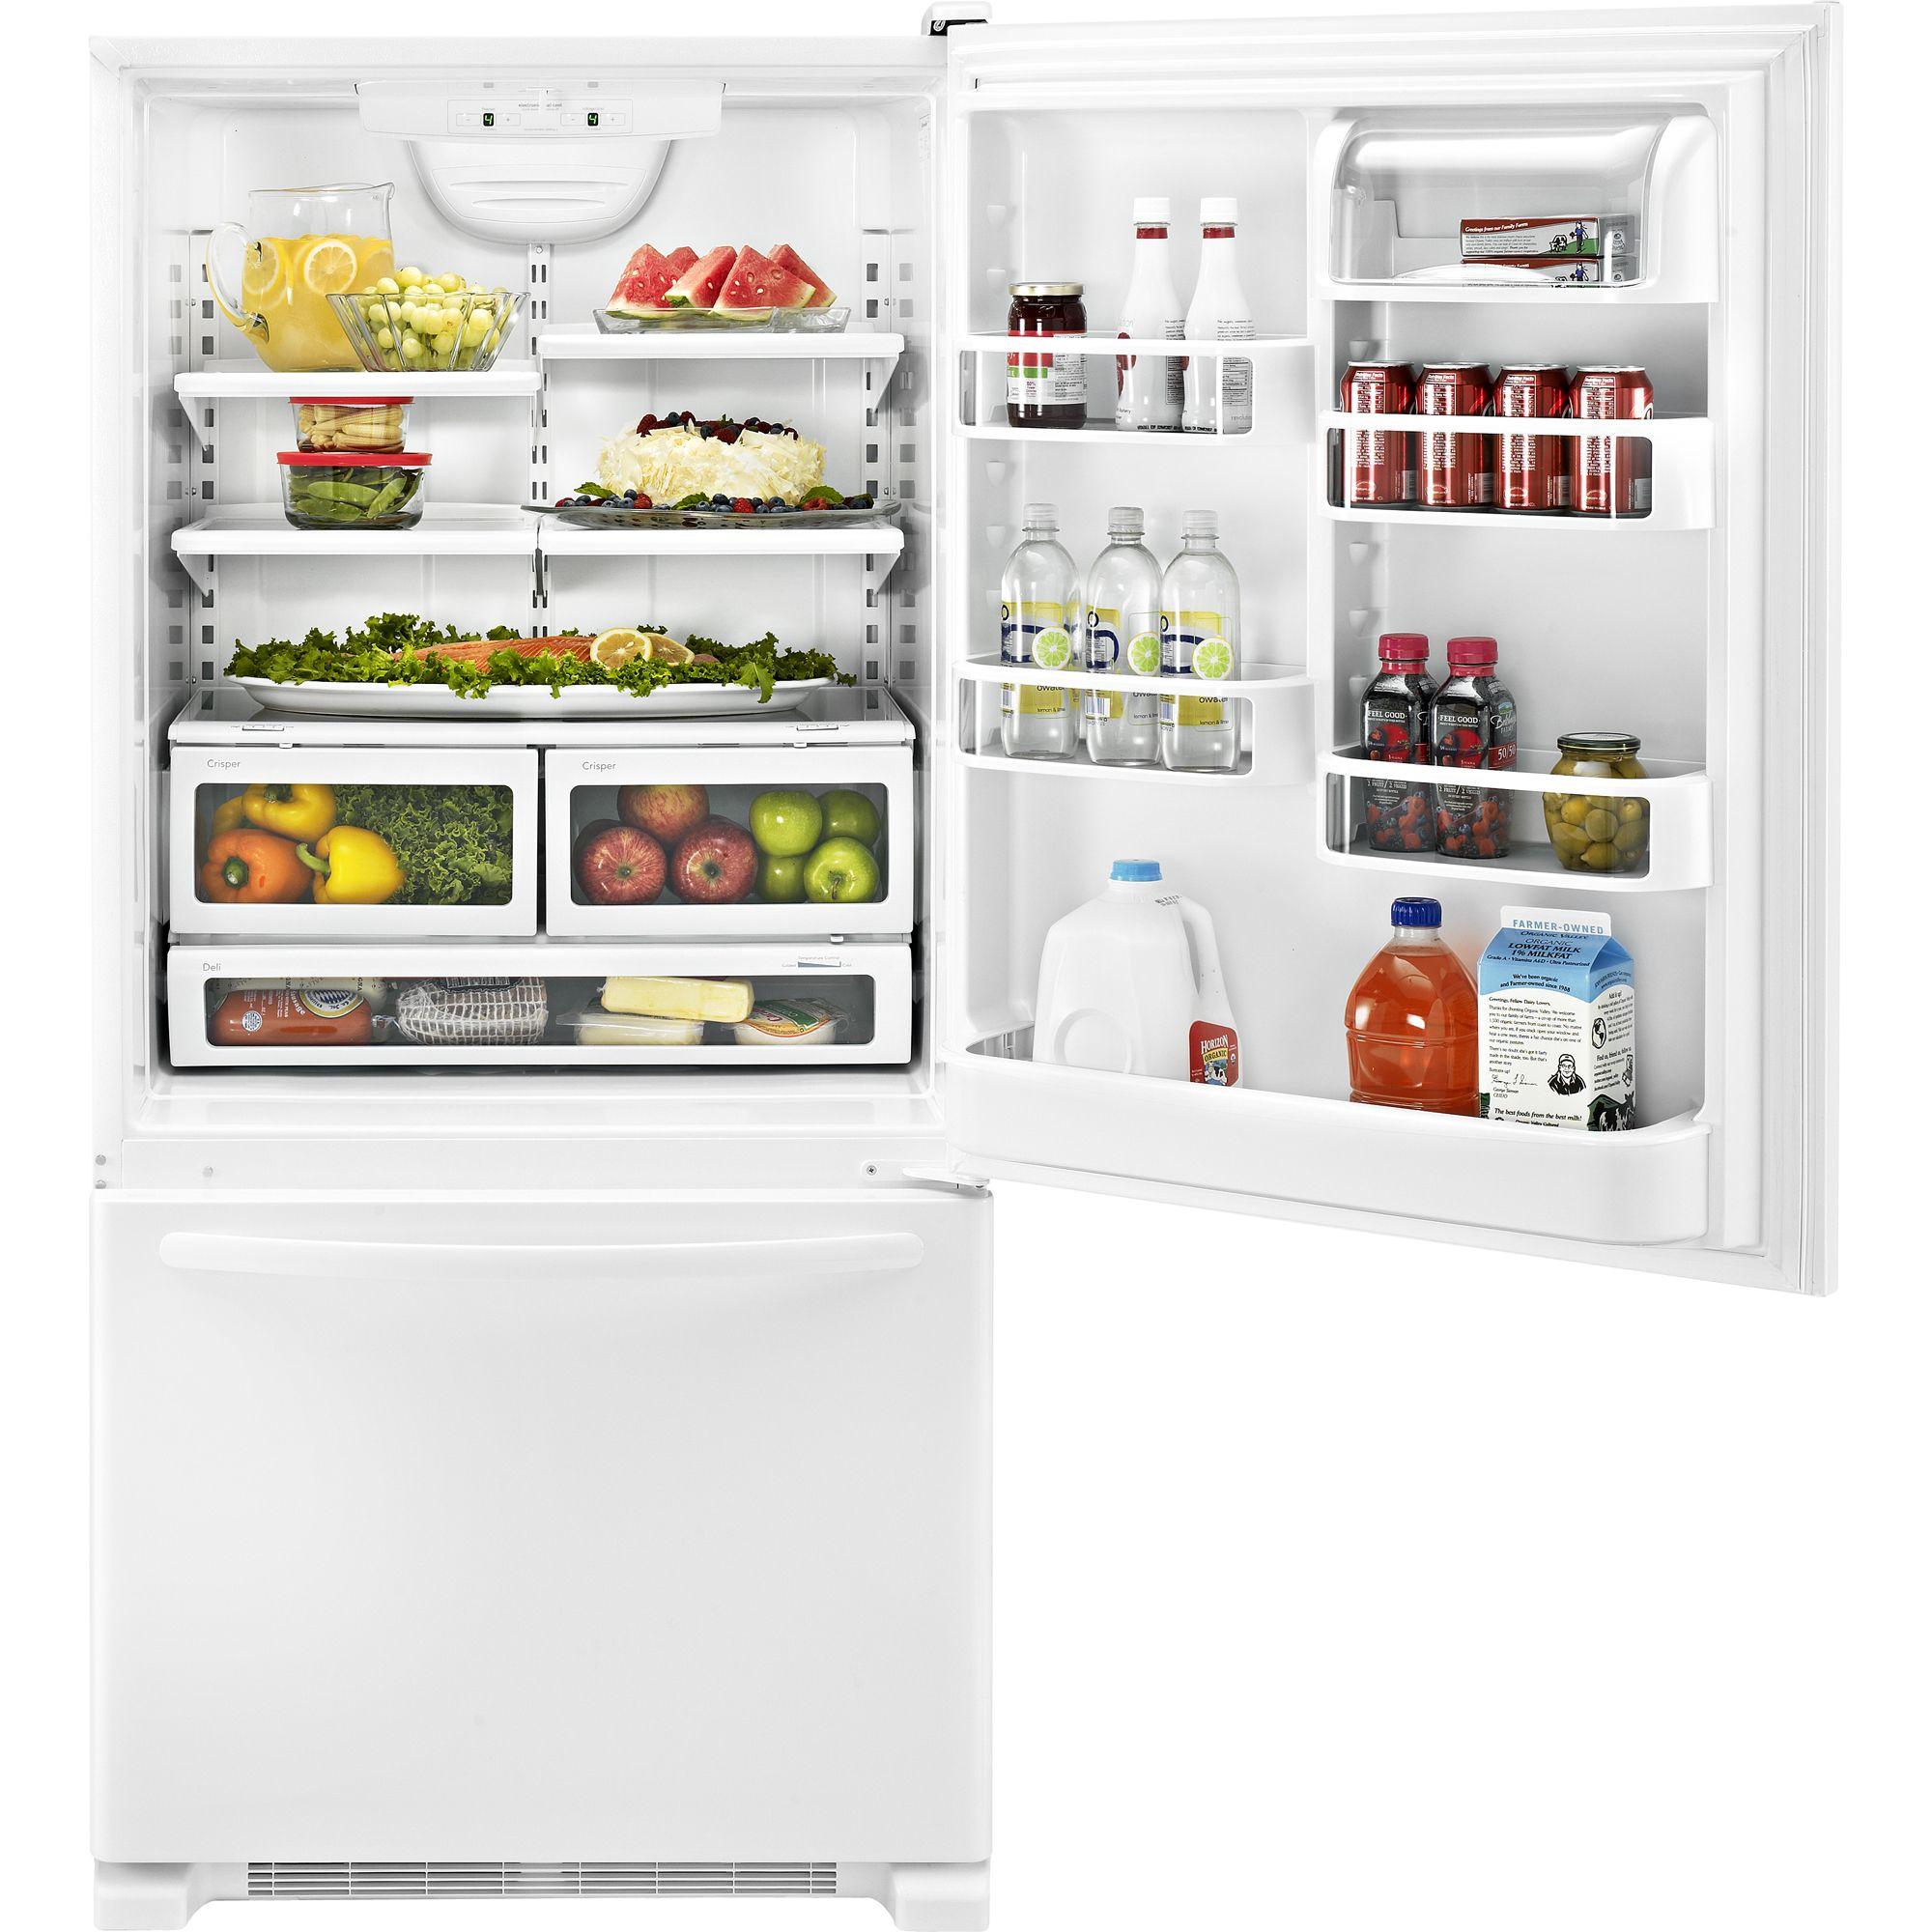 KitchenAid 21.9 cu. ft. Single-Door Bottom-Freezer Refrigerator